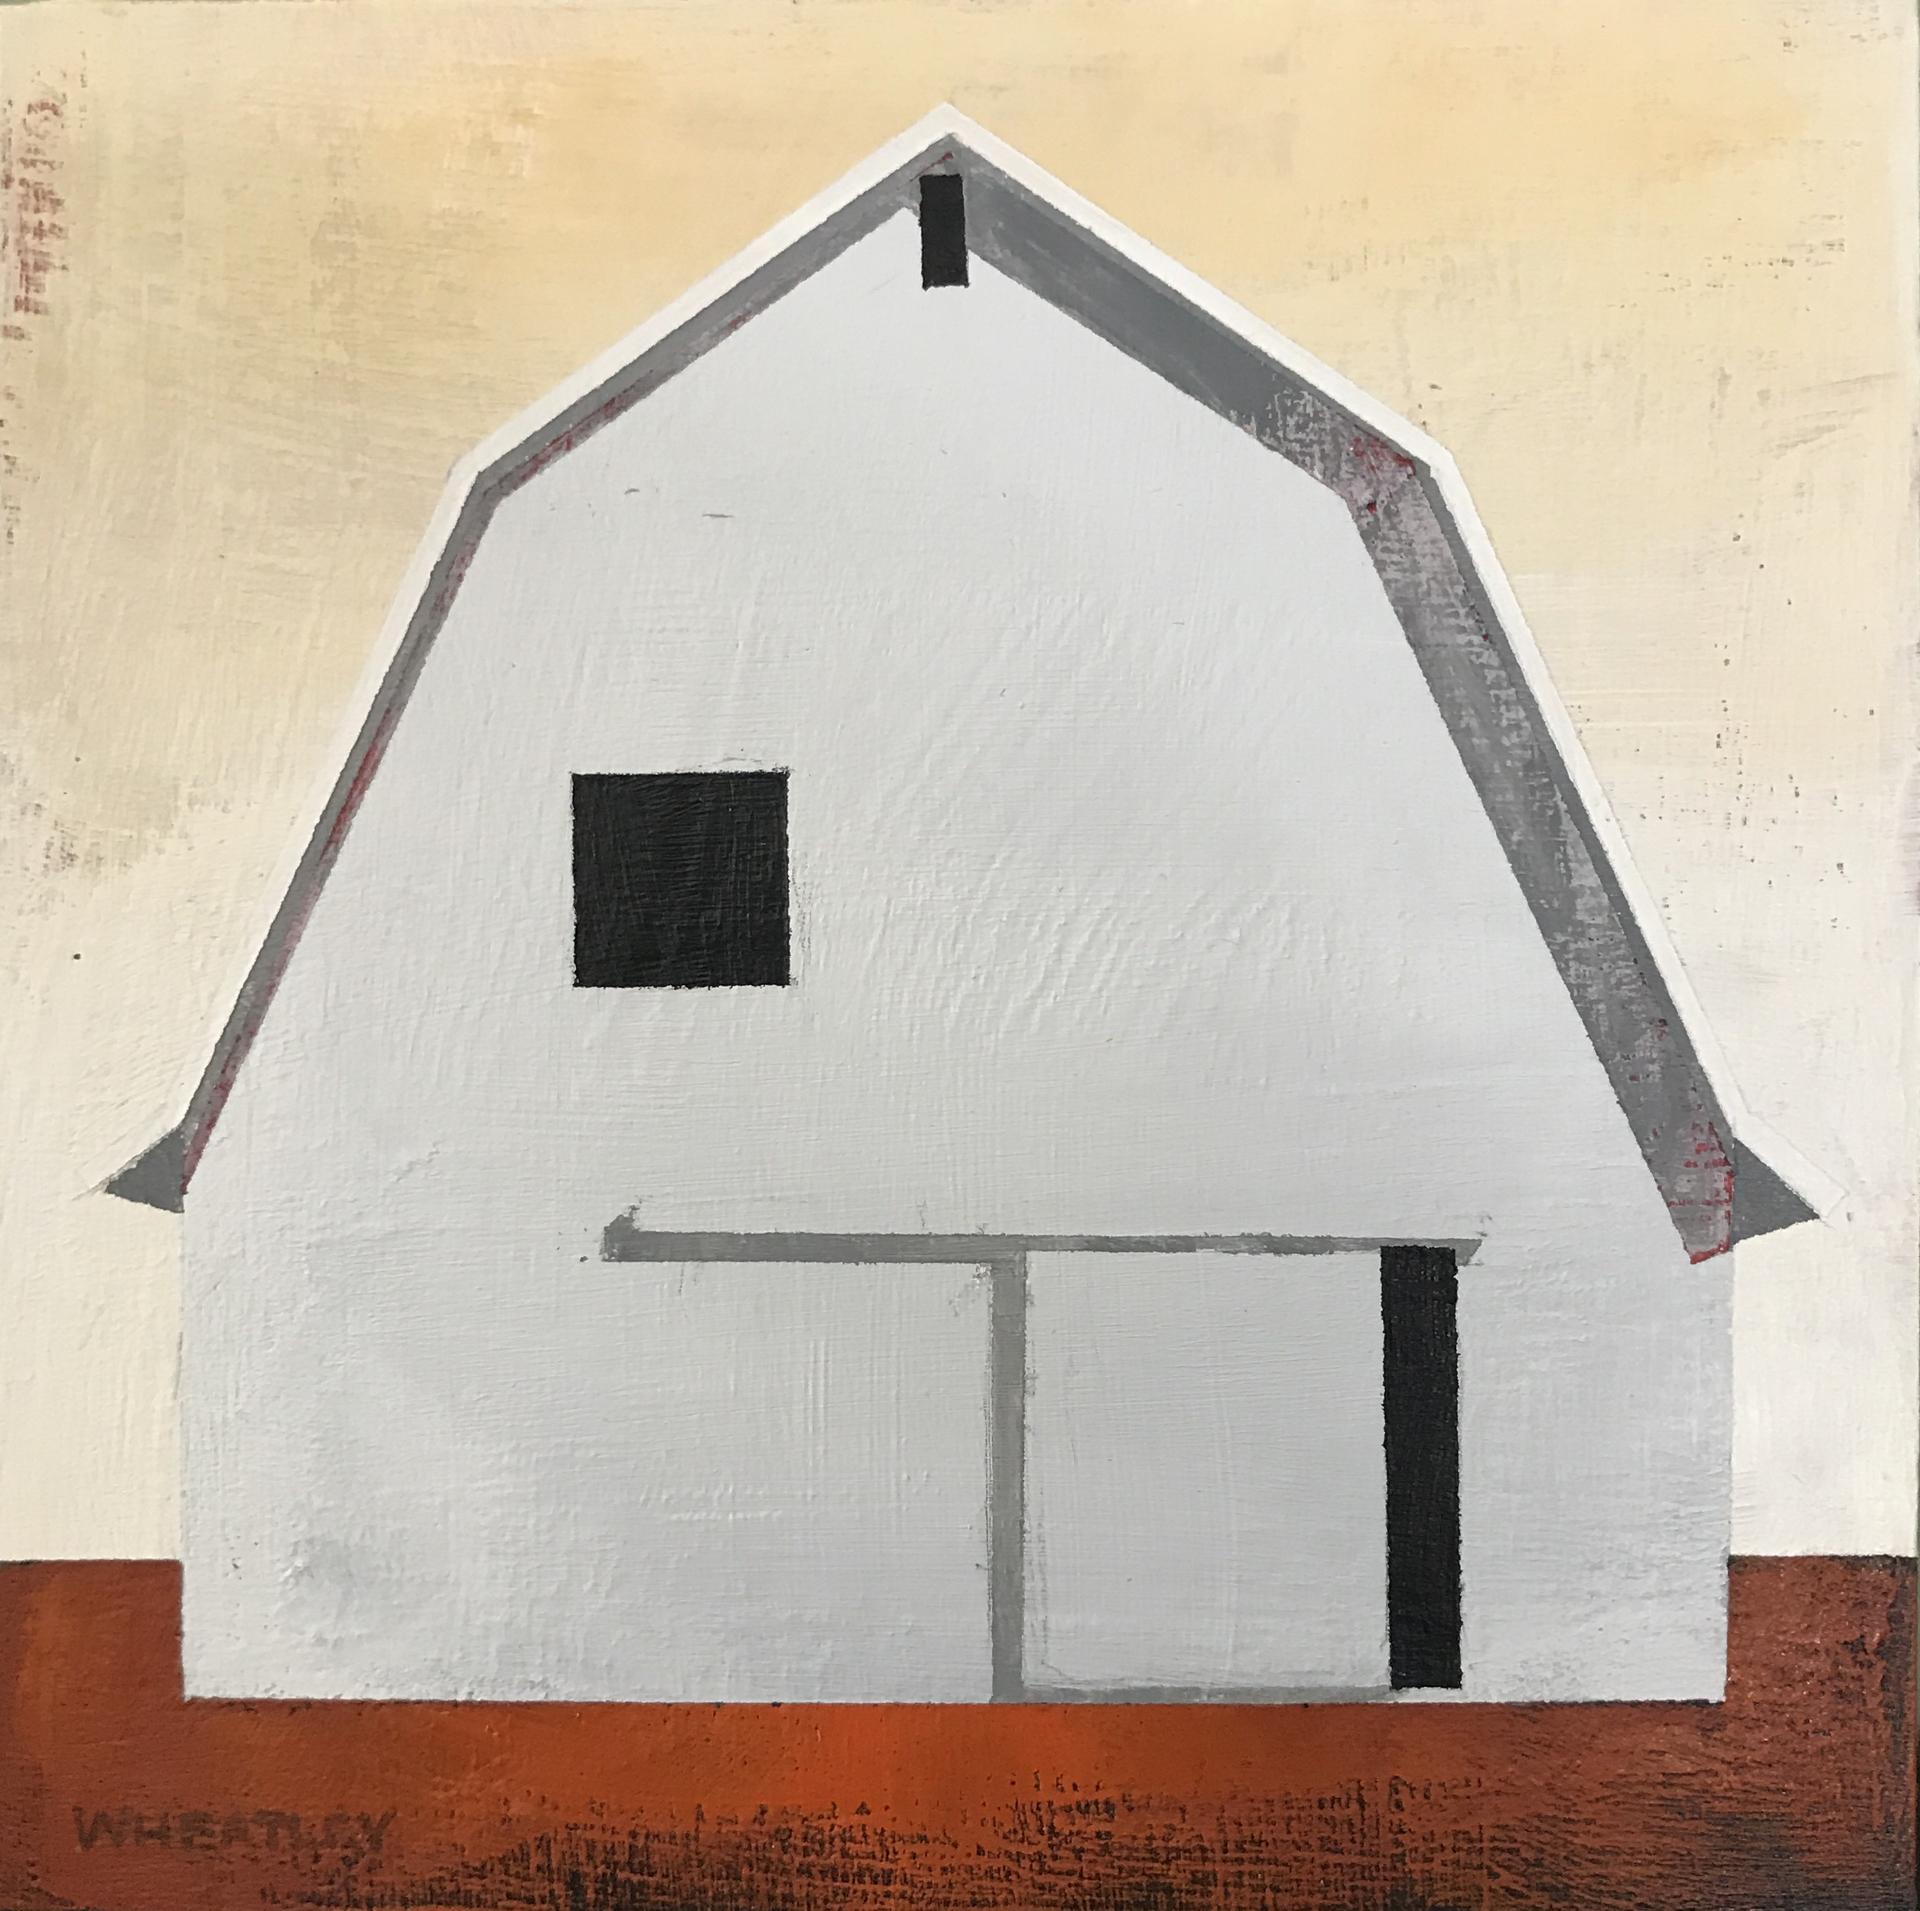 White Barn III by Justin Wheatley